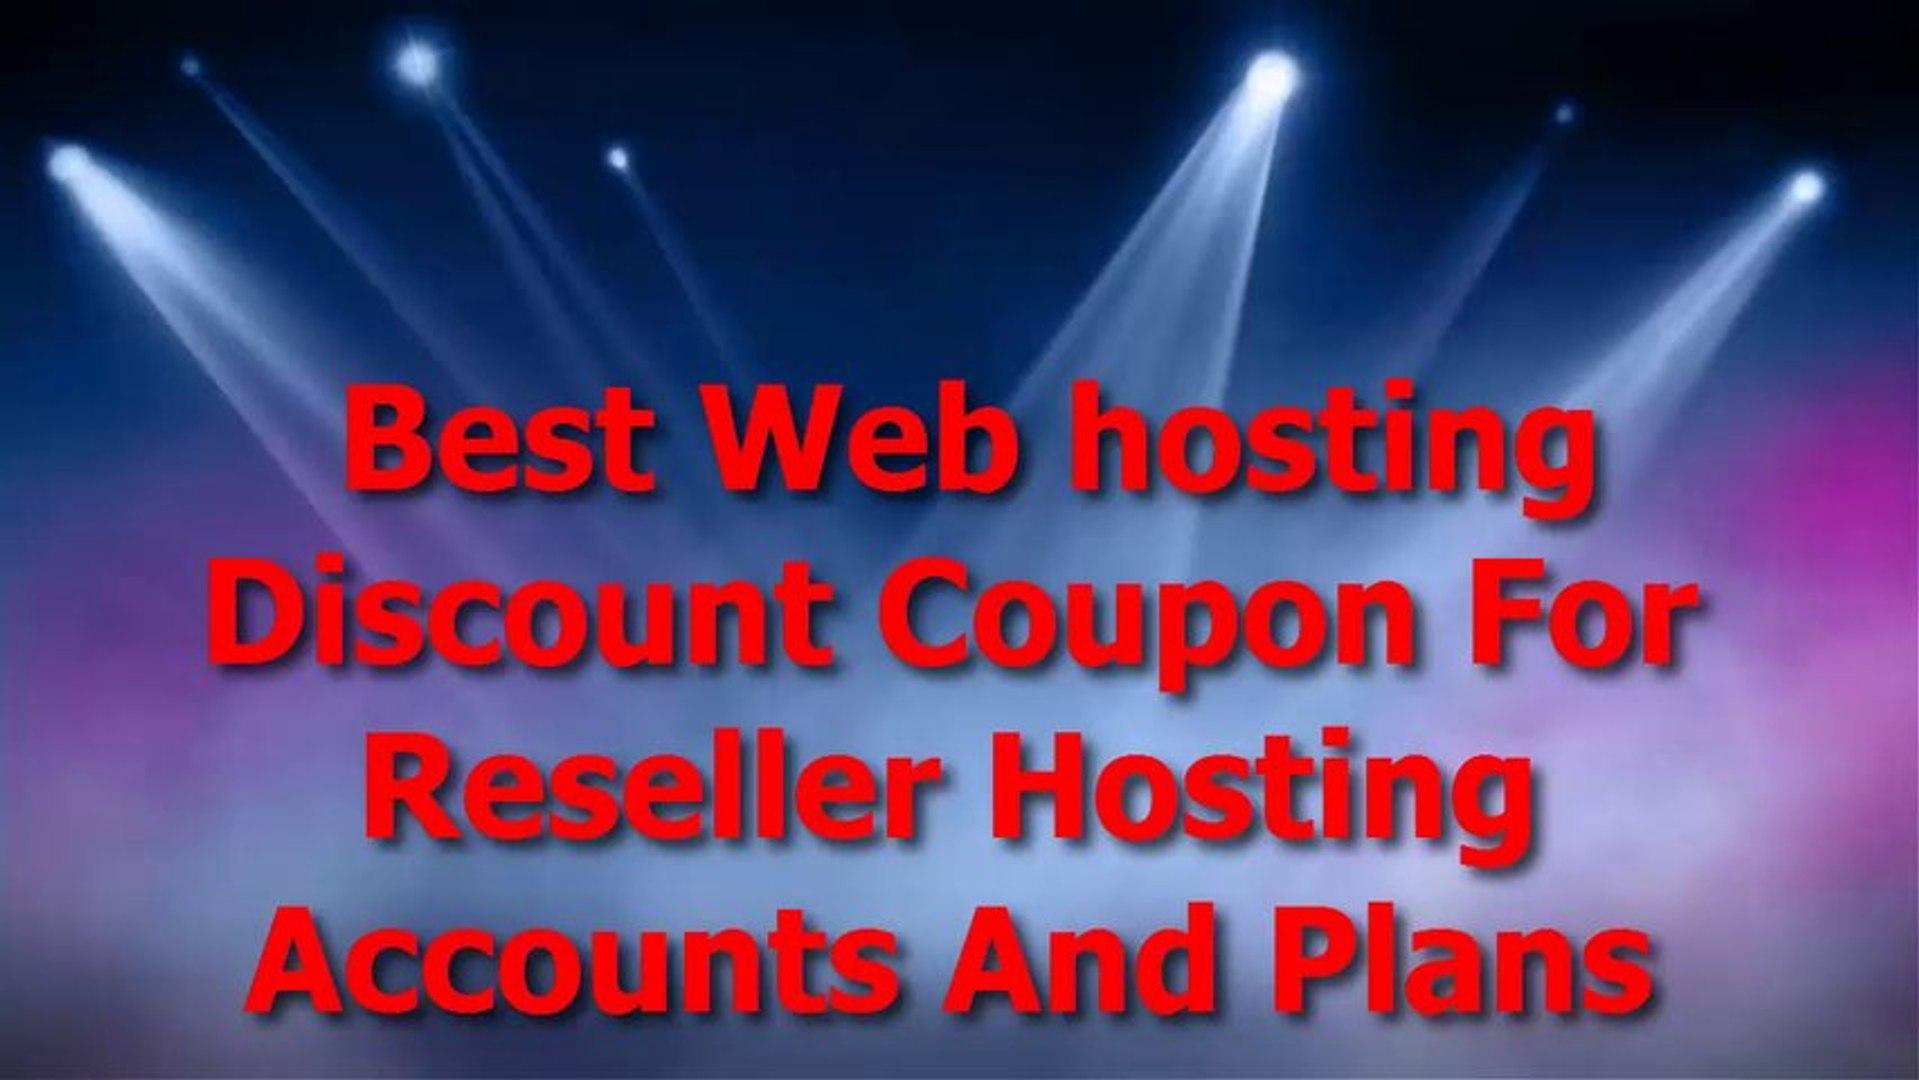 Hostgator Reseller Coupon Code 2014 | Best Web hosting Discount Coupons For Reseller Hosting Account